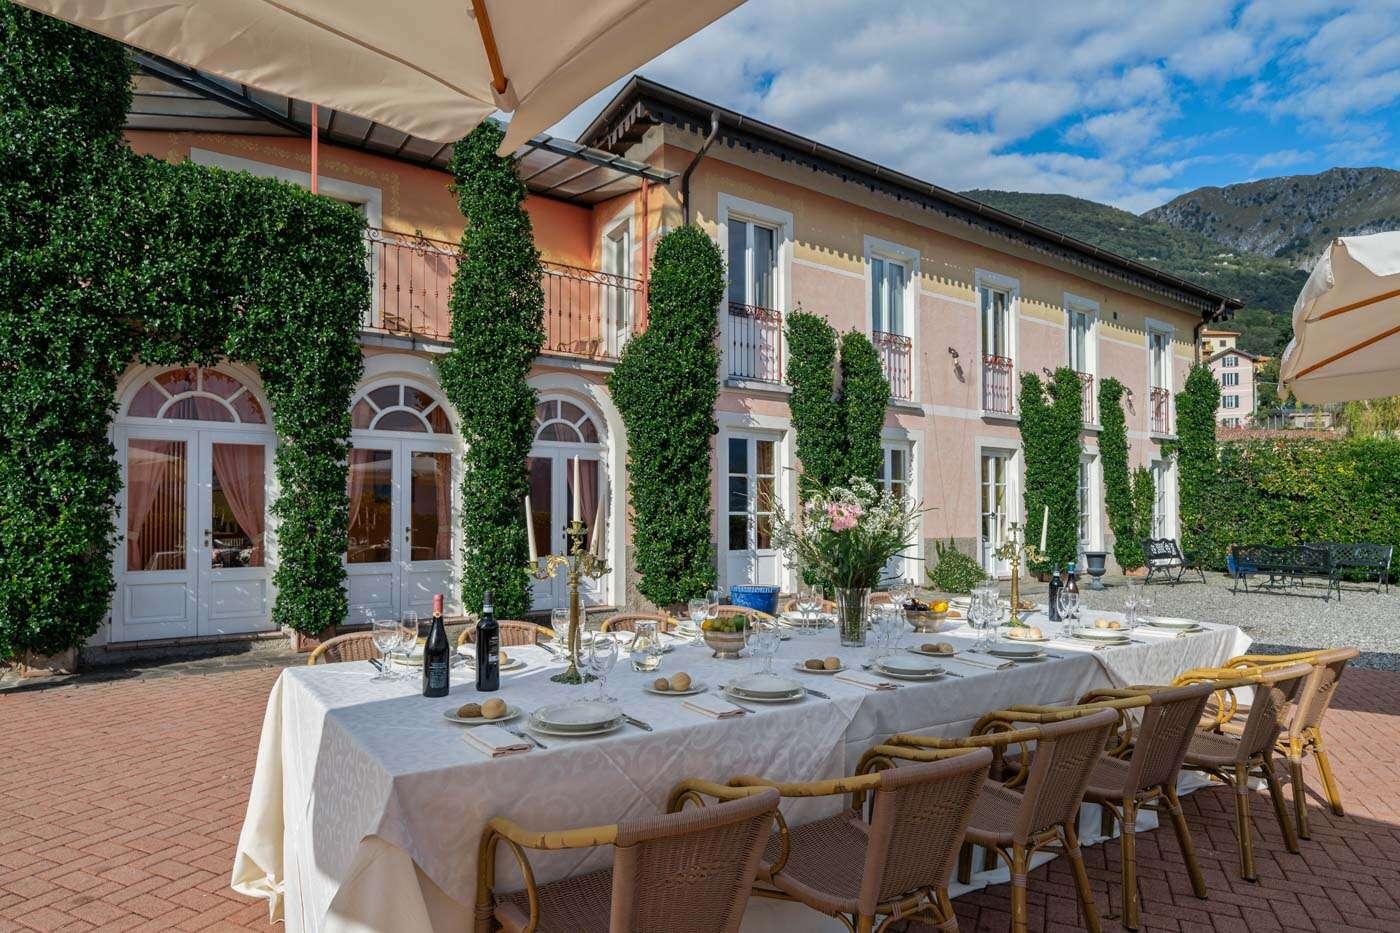 Luxury vacation rentals europe - Italy - Melite - Image 1/24